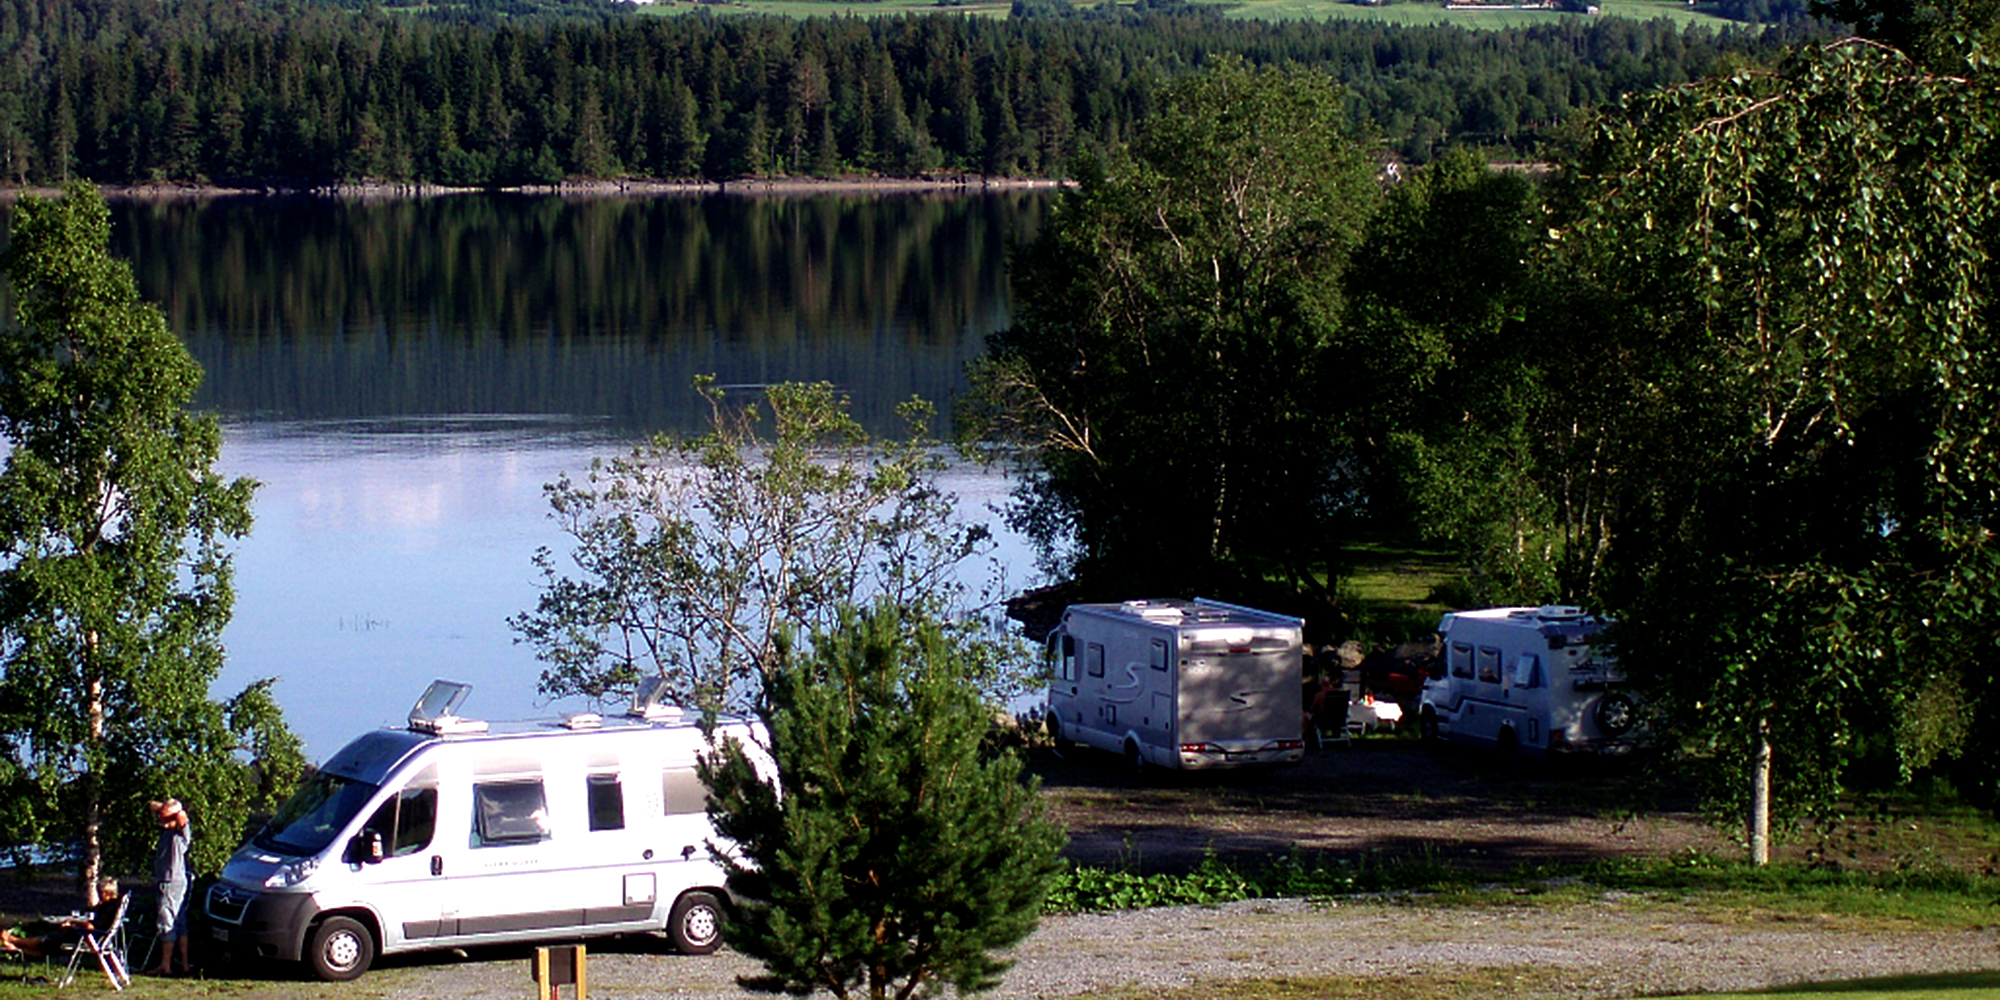 Kvam Motell og Camping - campingvogner. Copyright: Kvam Motell og Camping